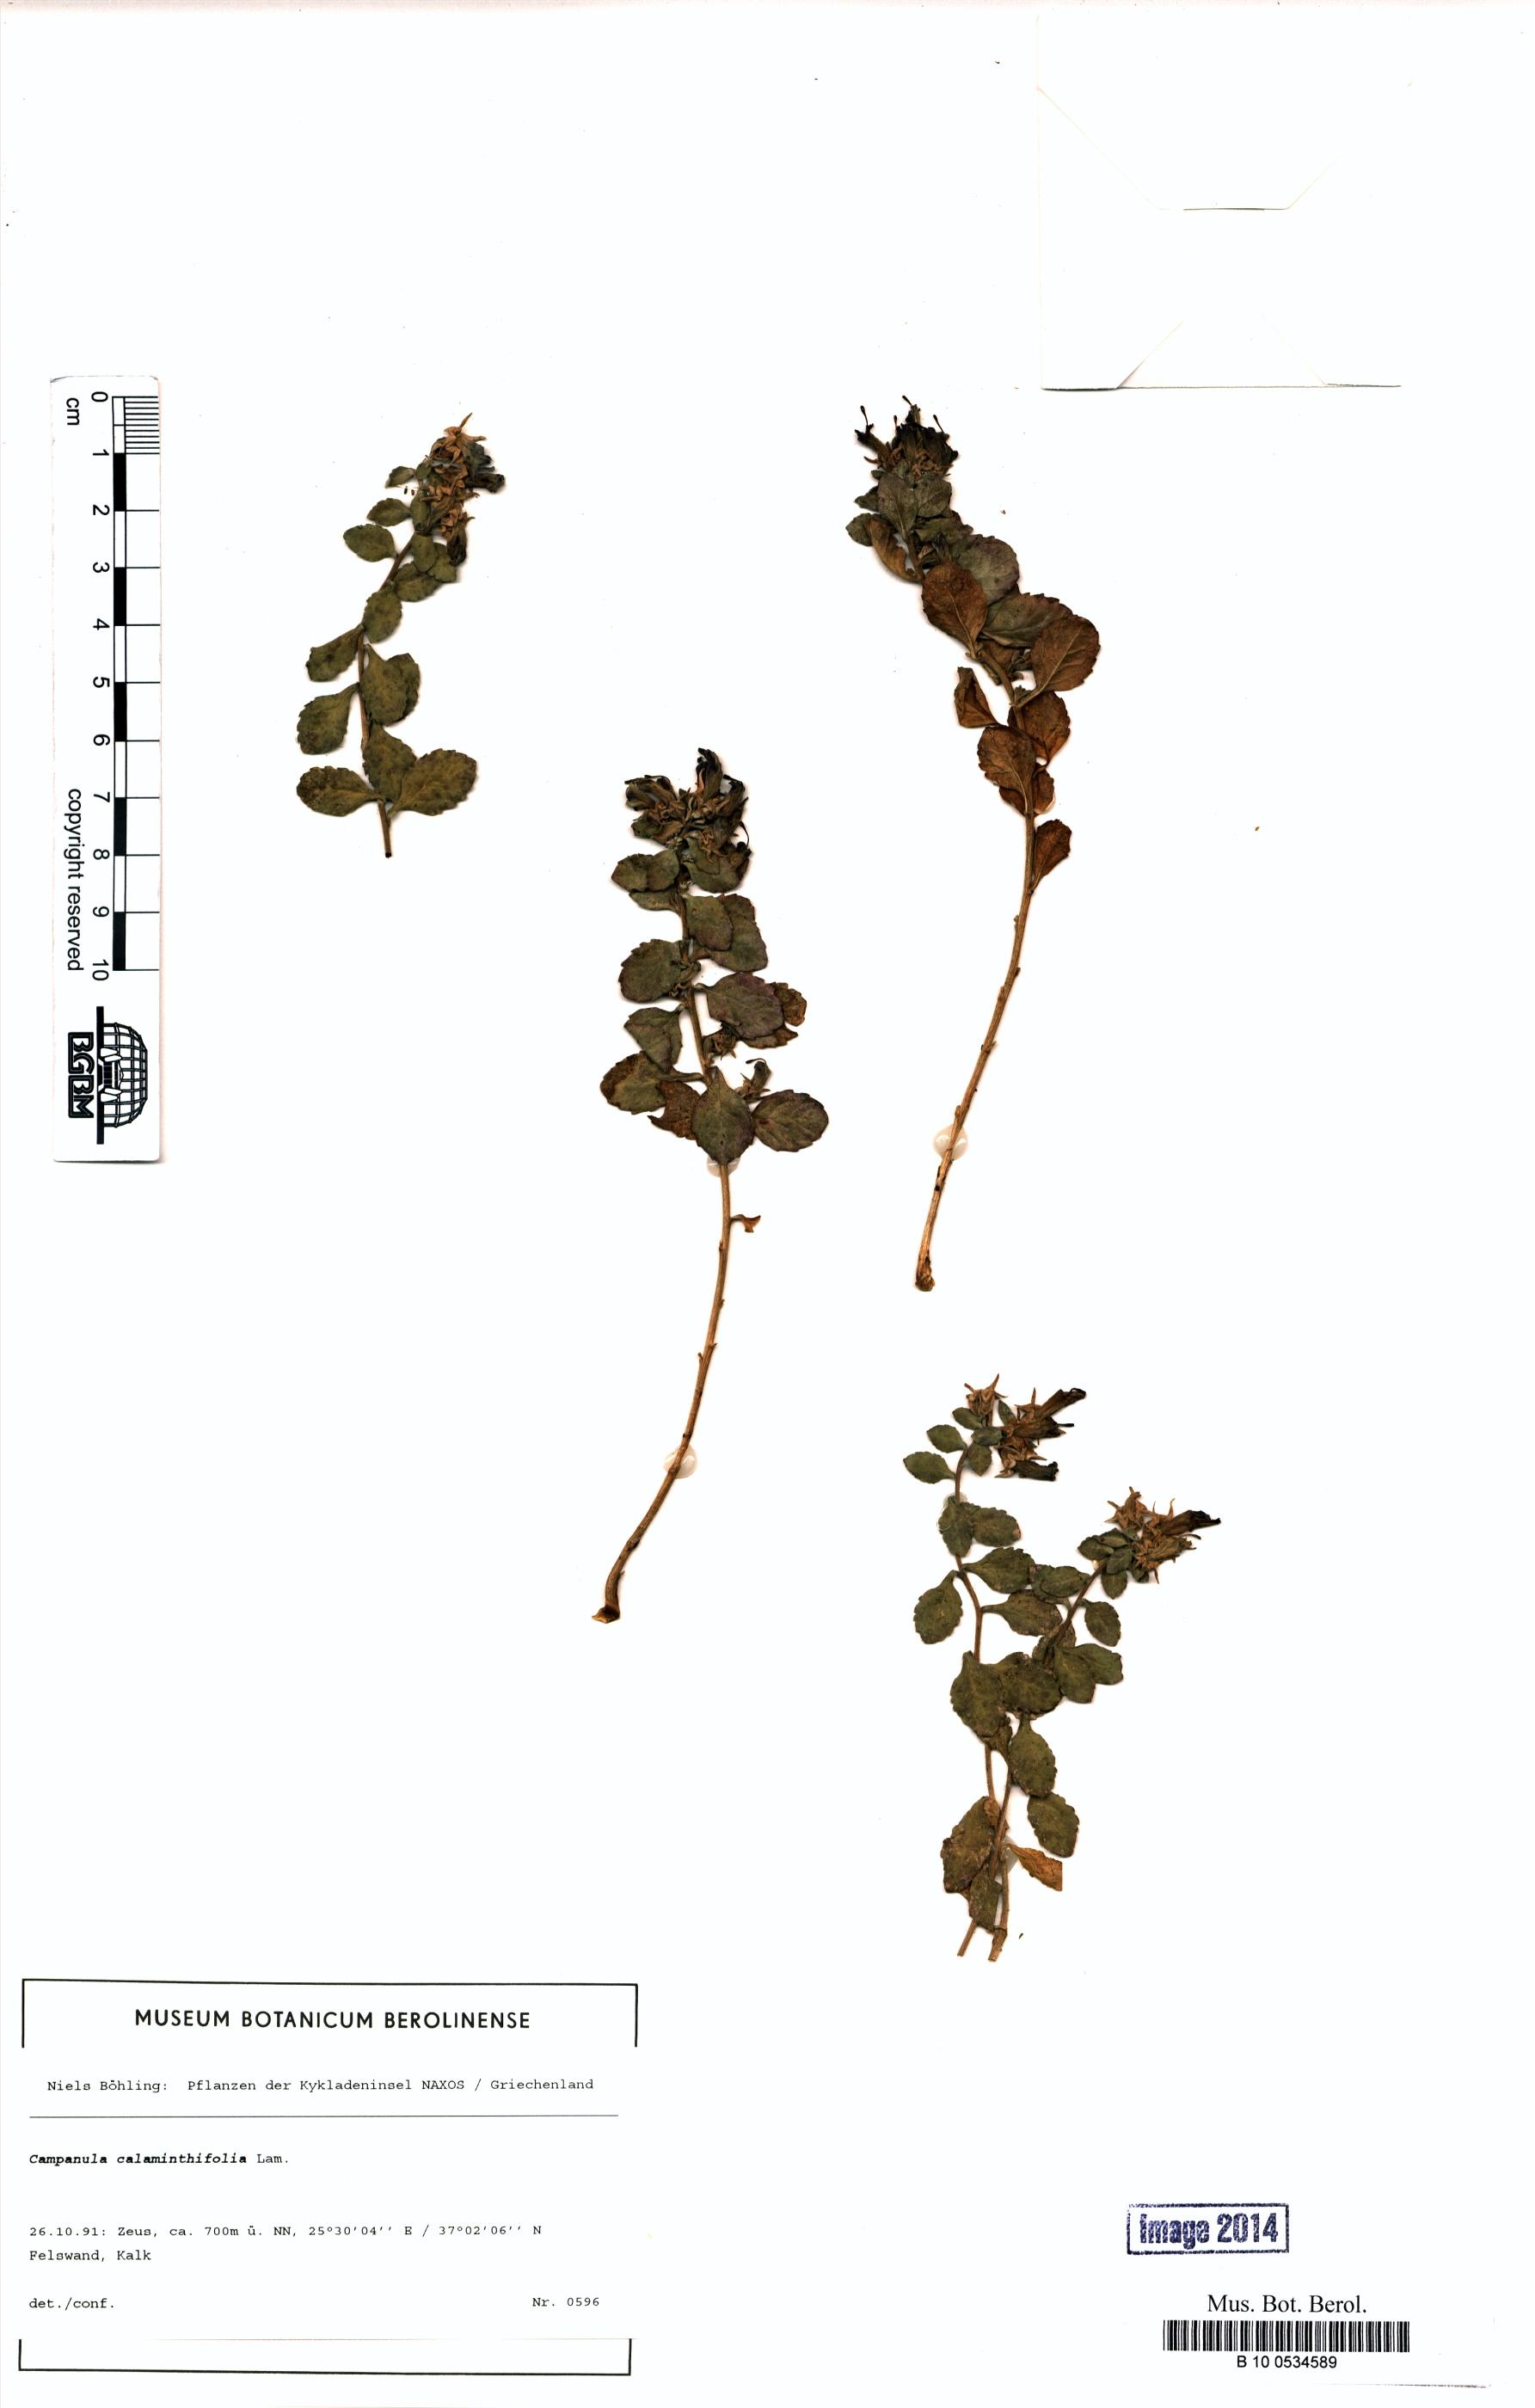 http://ww2.bgbm.org/herbarium/images/B/10/05/34/58/B_10_0534589.jpg